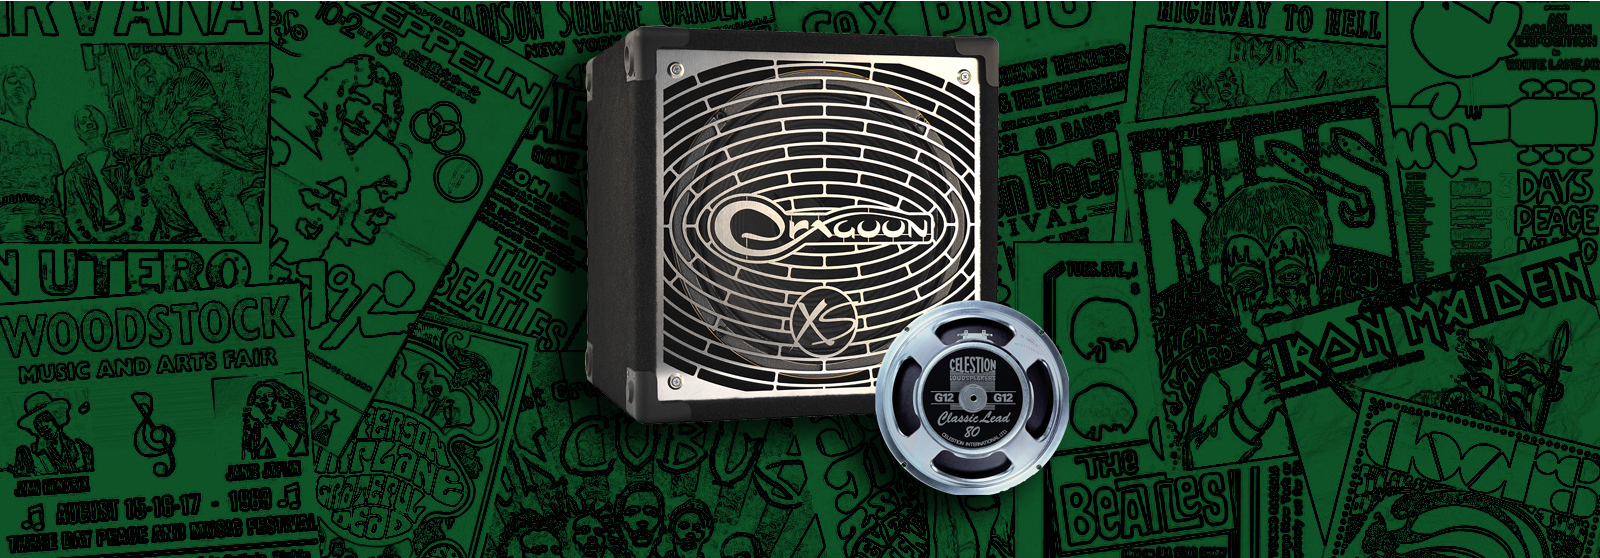 Dragoon - The Custom Speaker - DRAGOON-XSCL_2016063000360255007.jpg